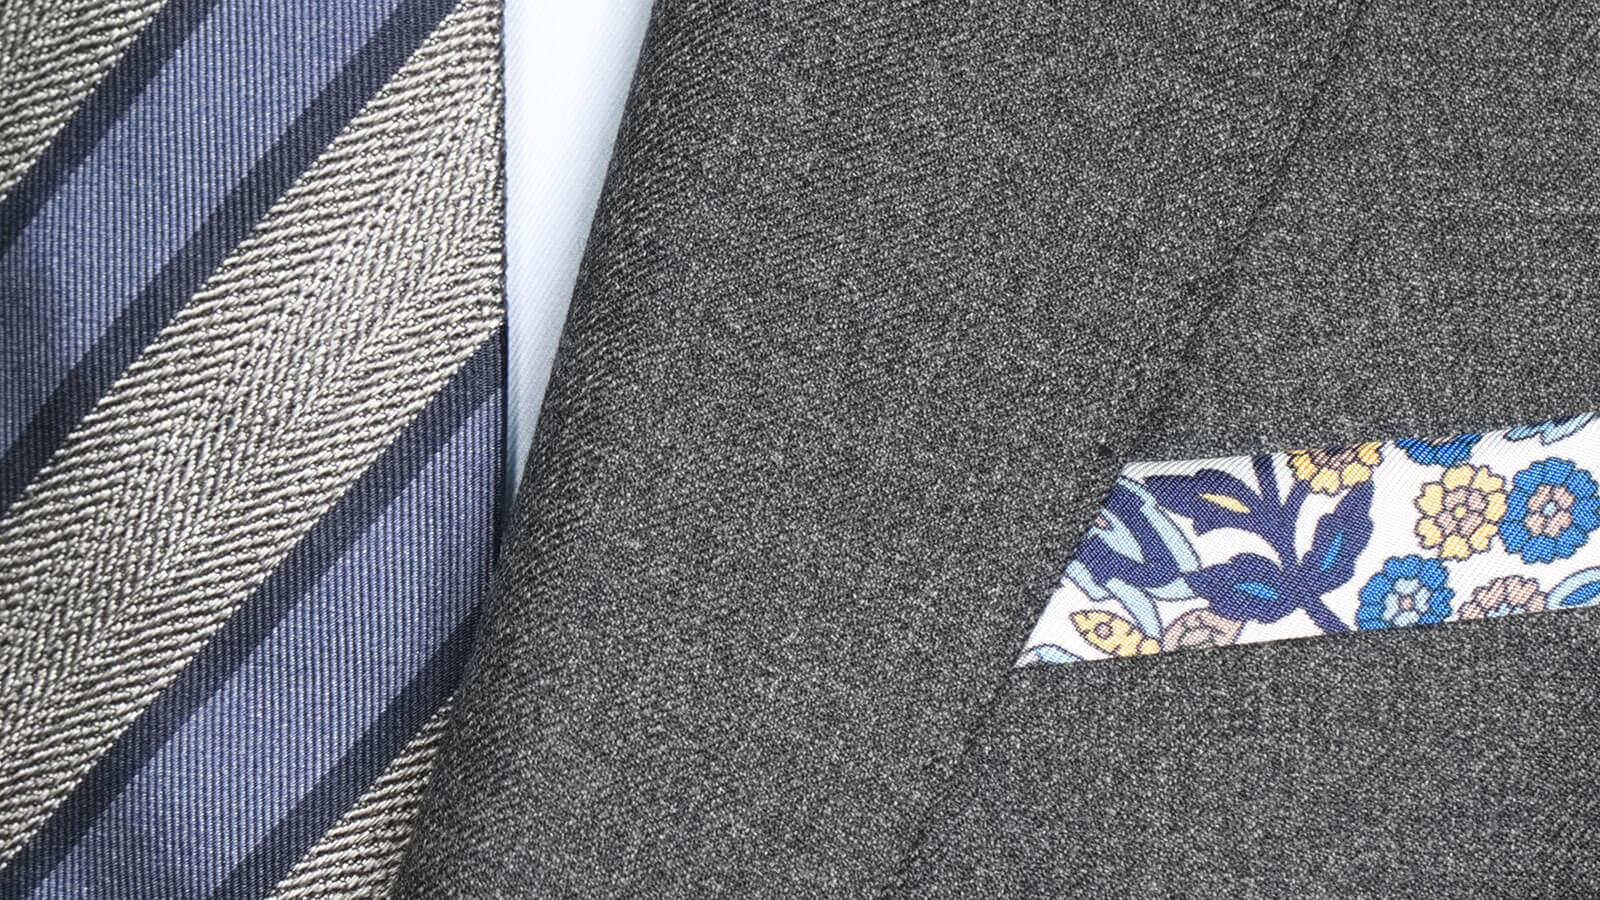 Worsted Chine Dark Grey Suit - slider image 1